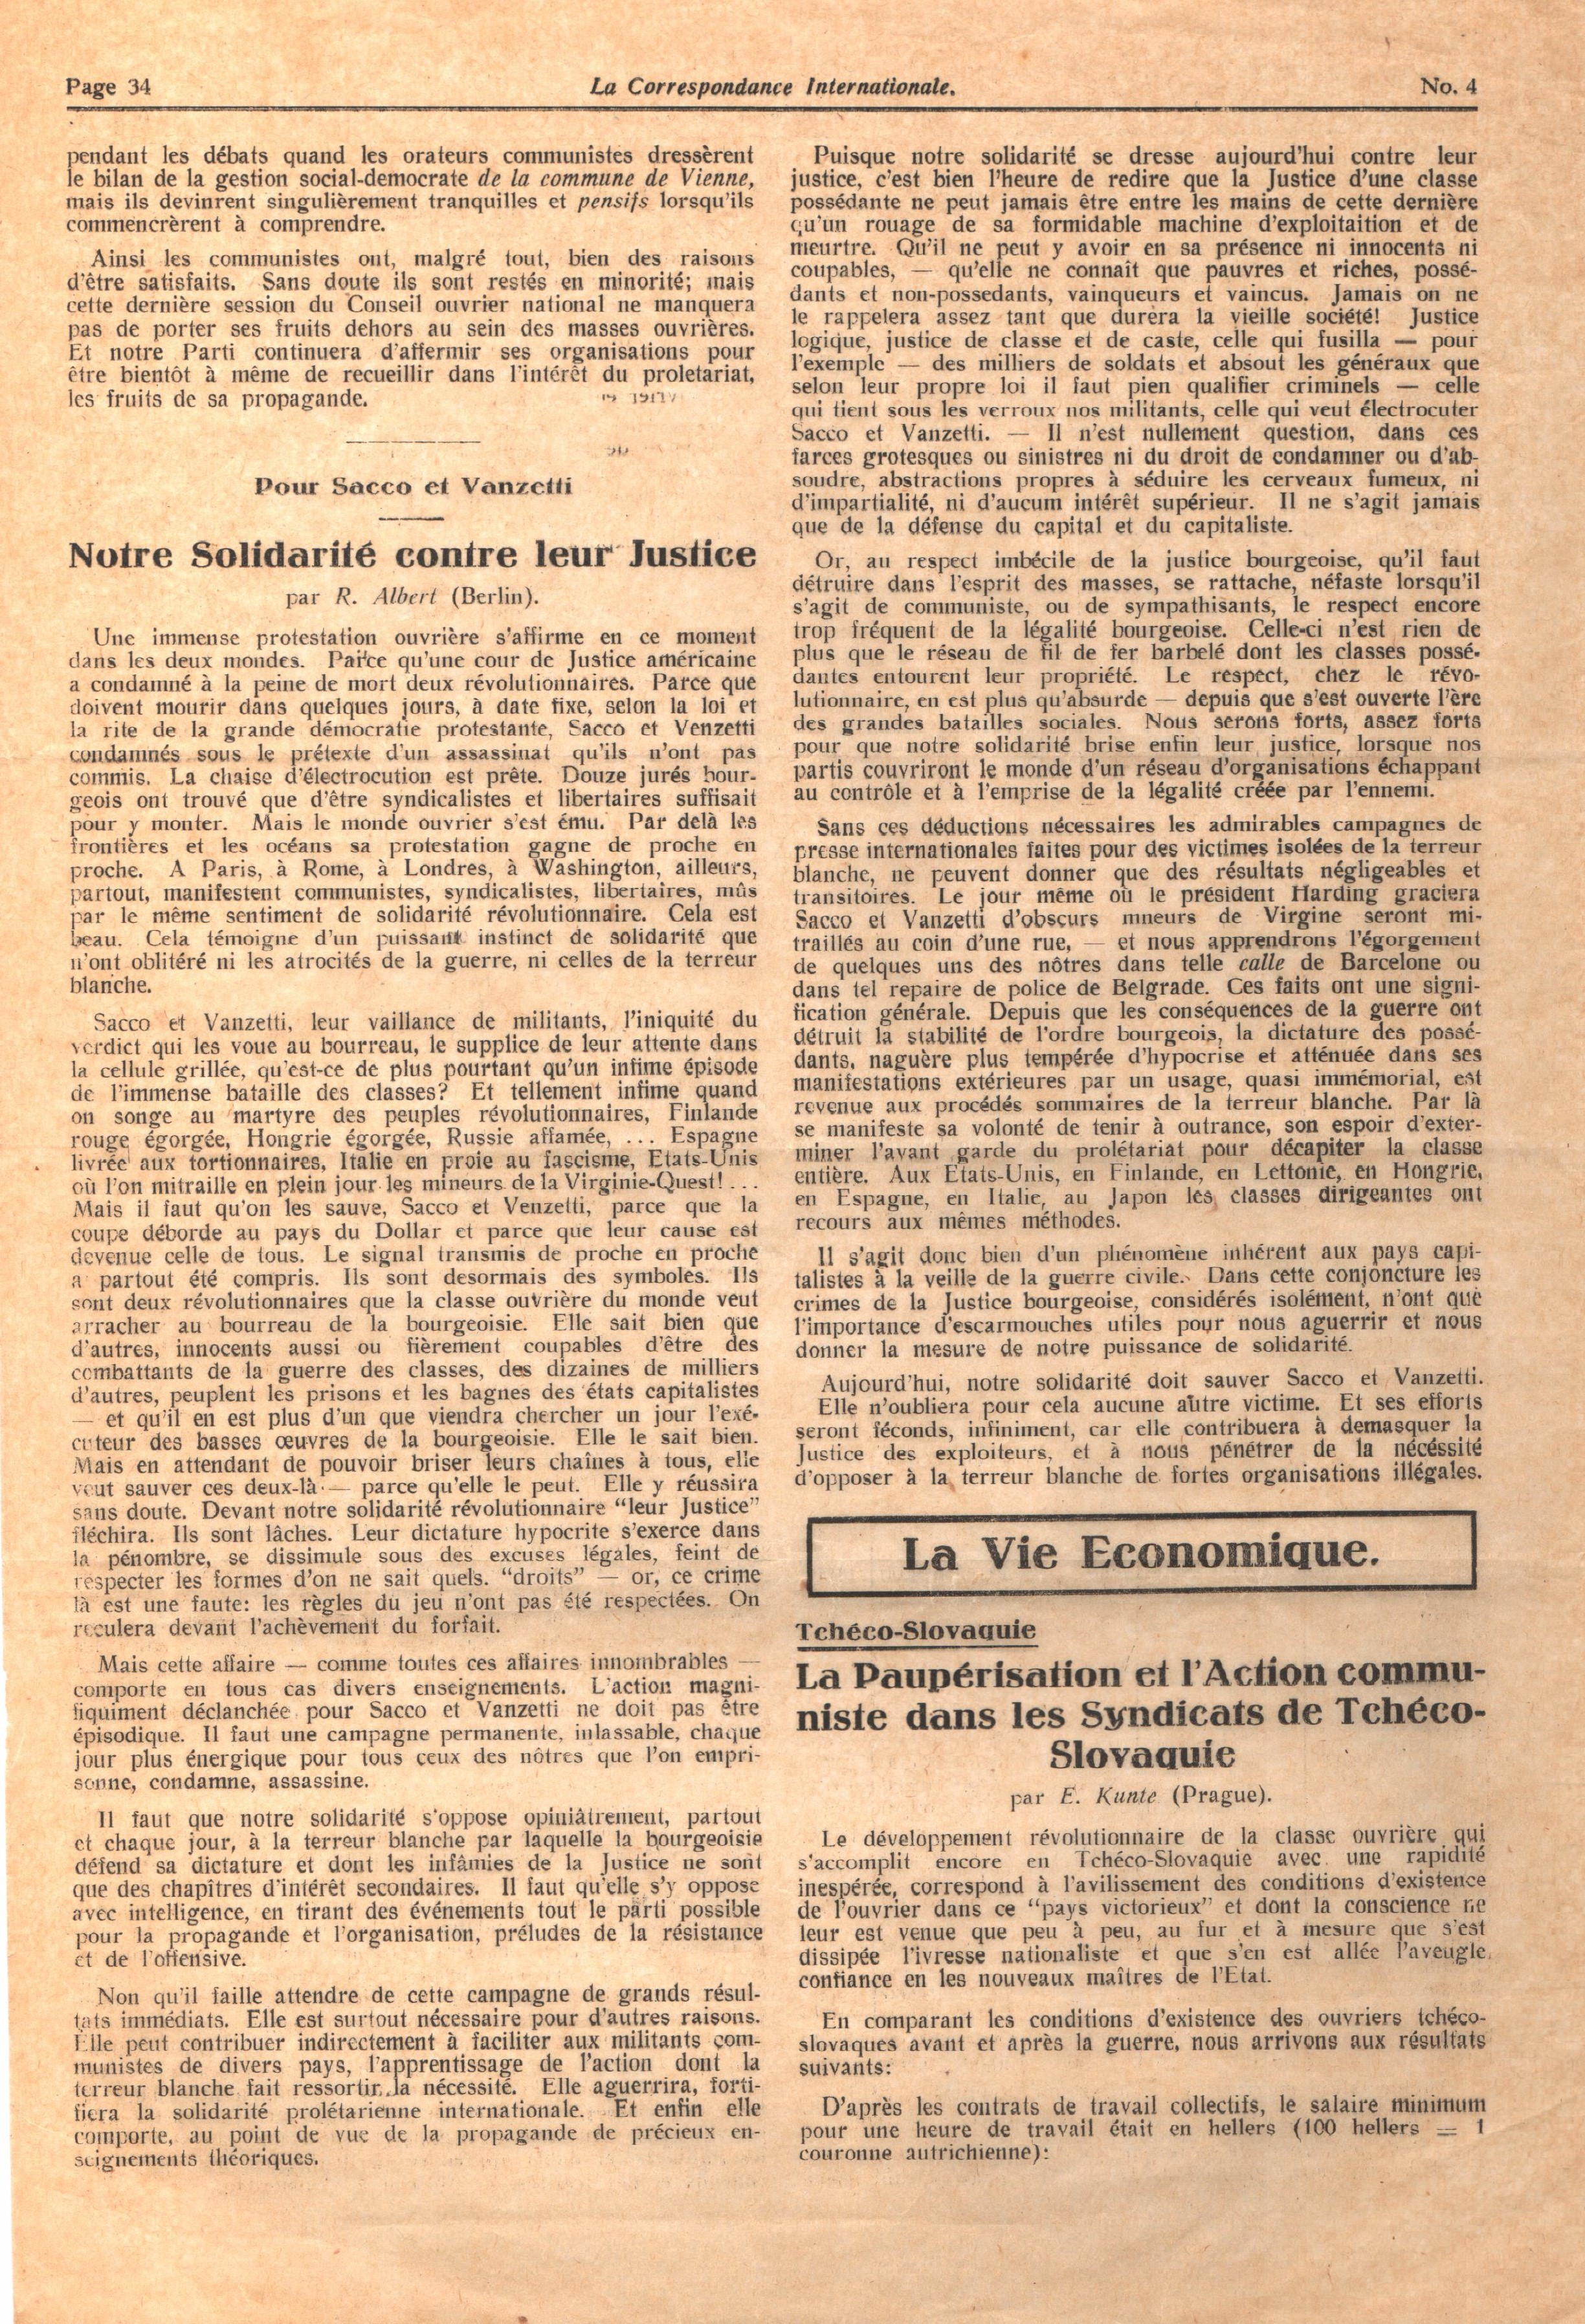 Correspondance Internationale n. 4 - pag. 6